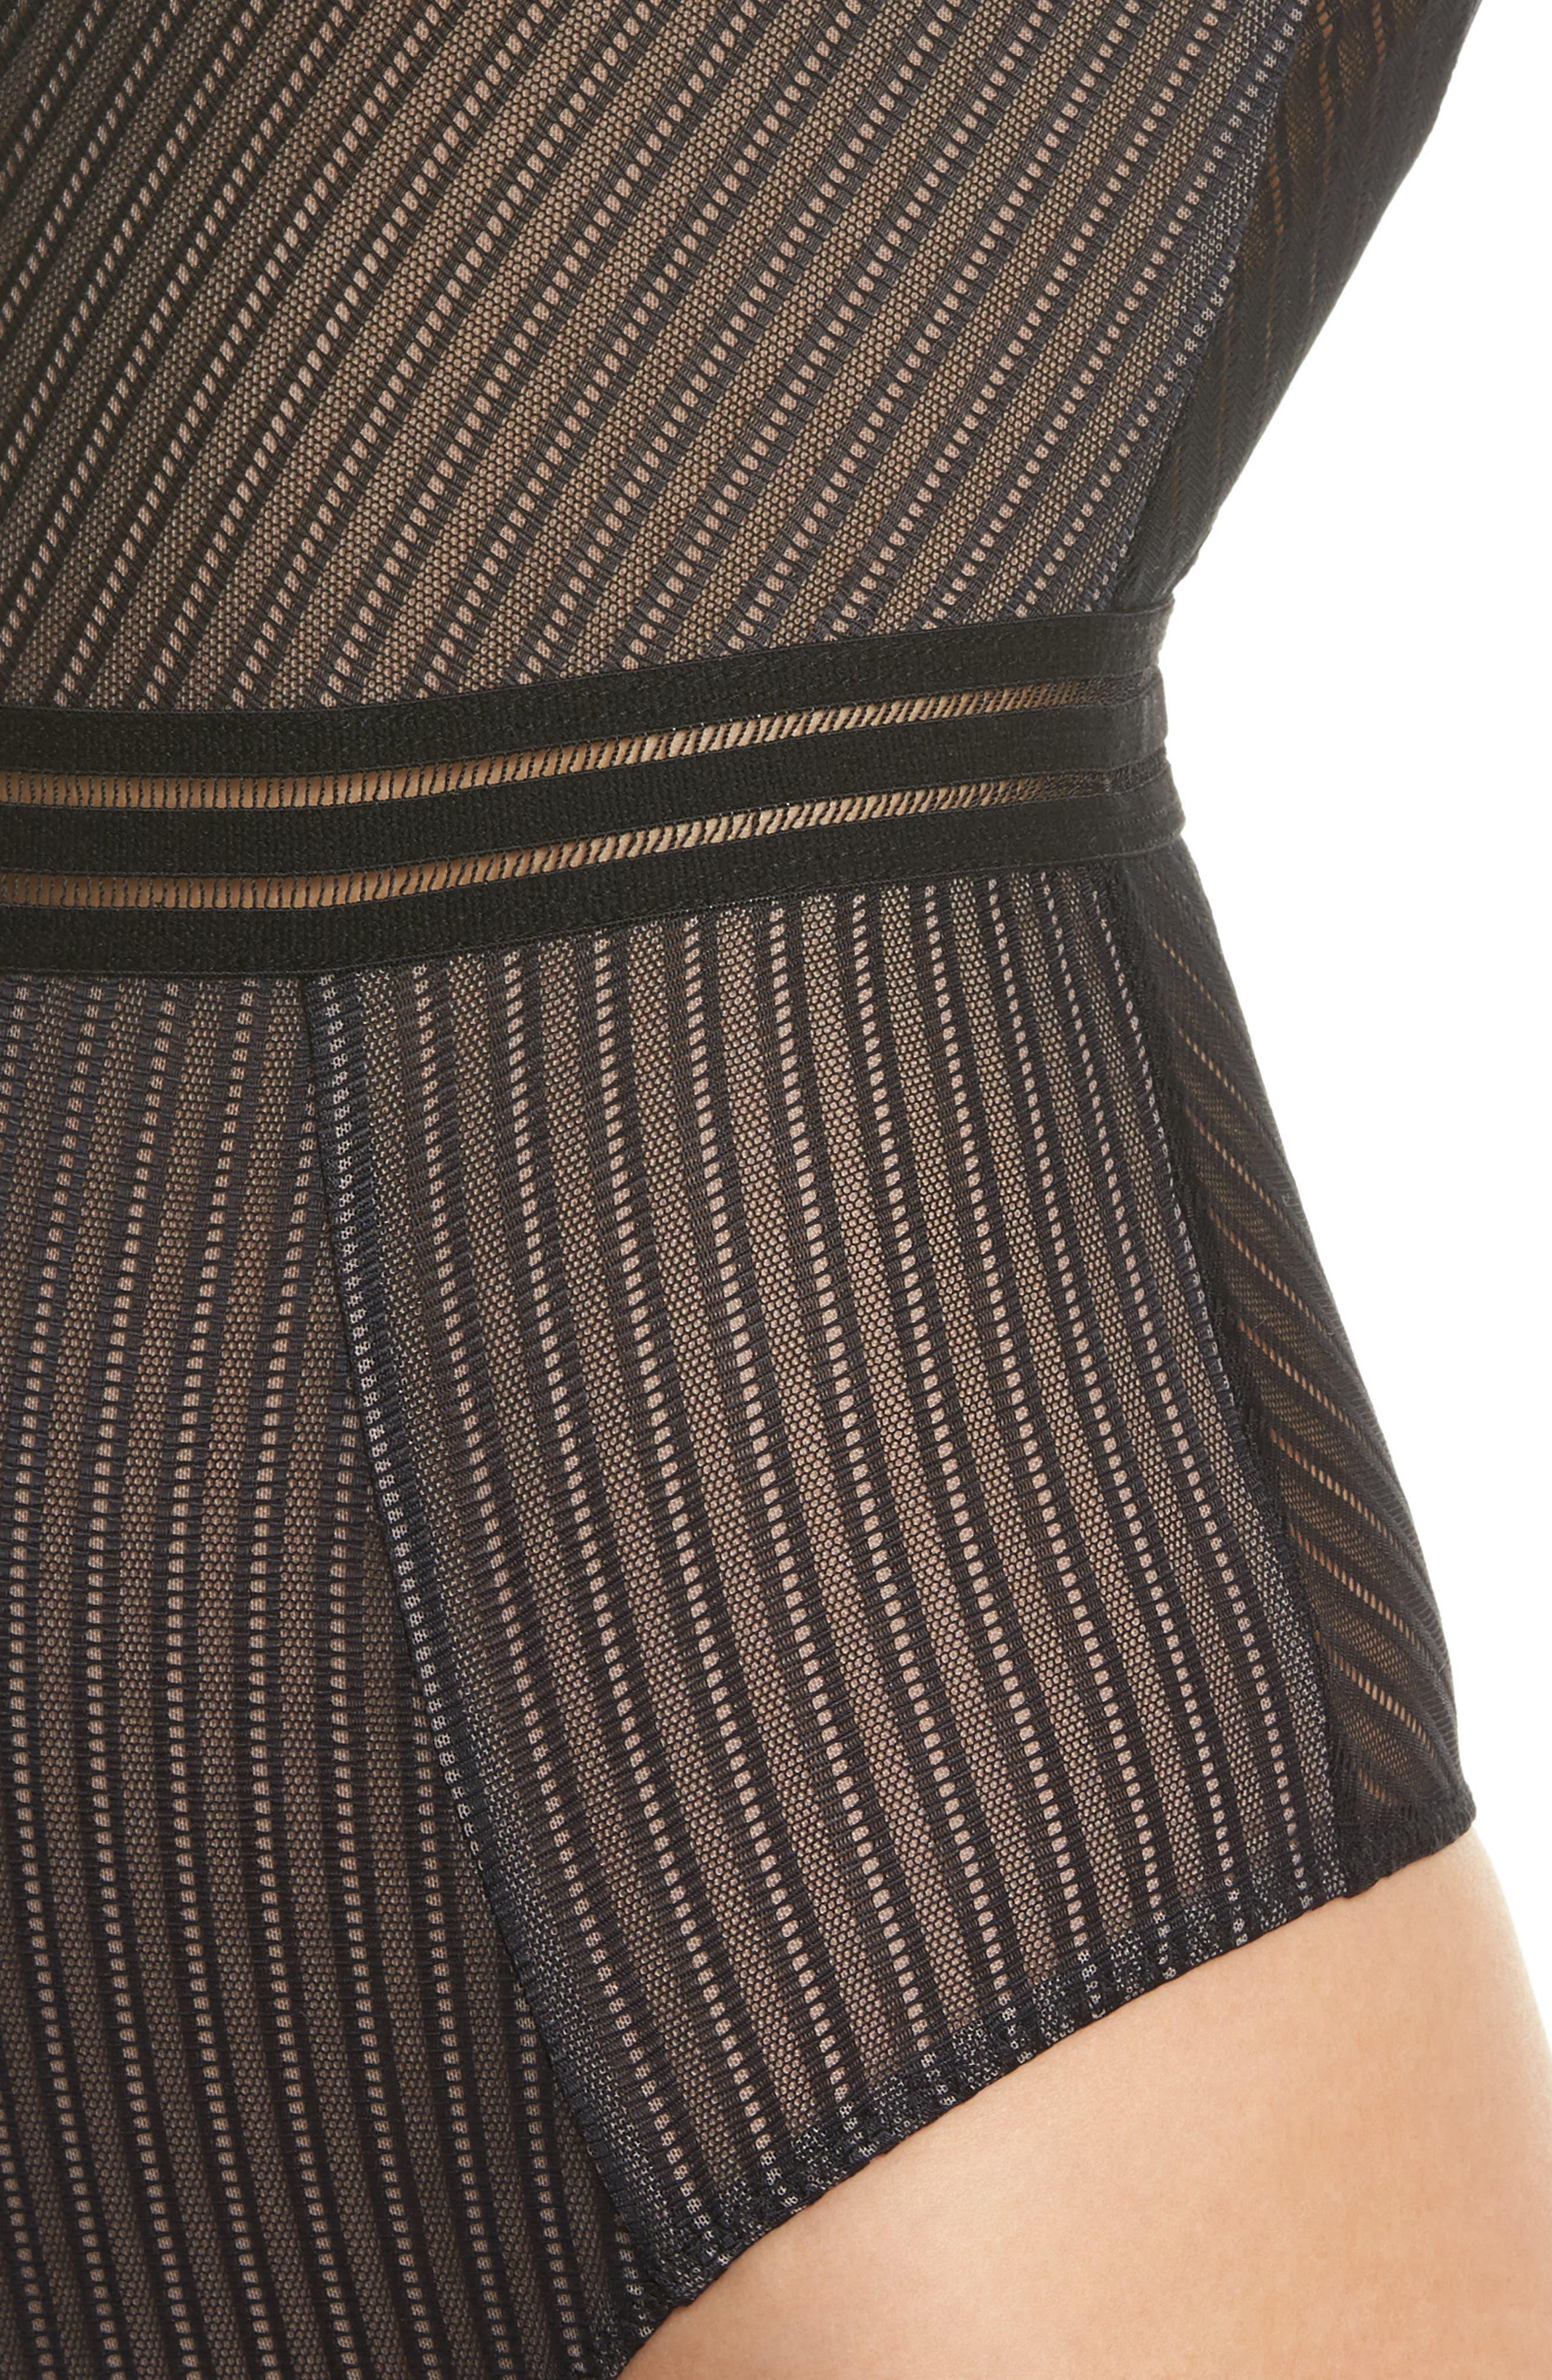 Arabella Thong Bodysuit,                             Alternate thumbnail 5, color,                             Black